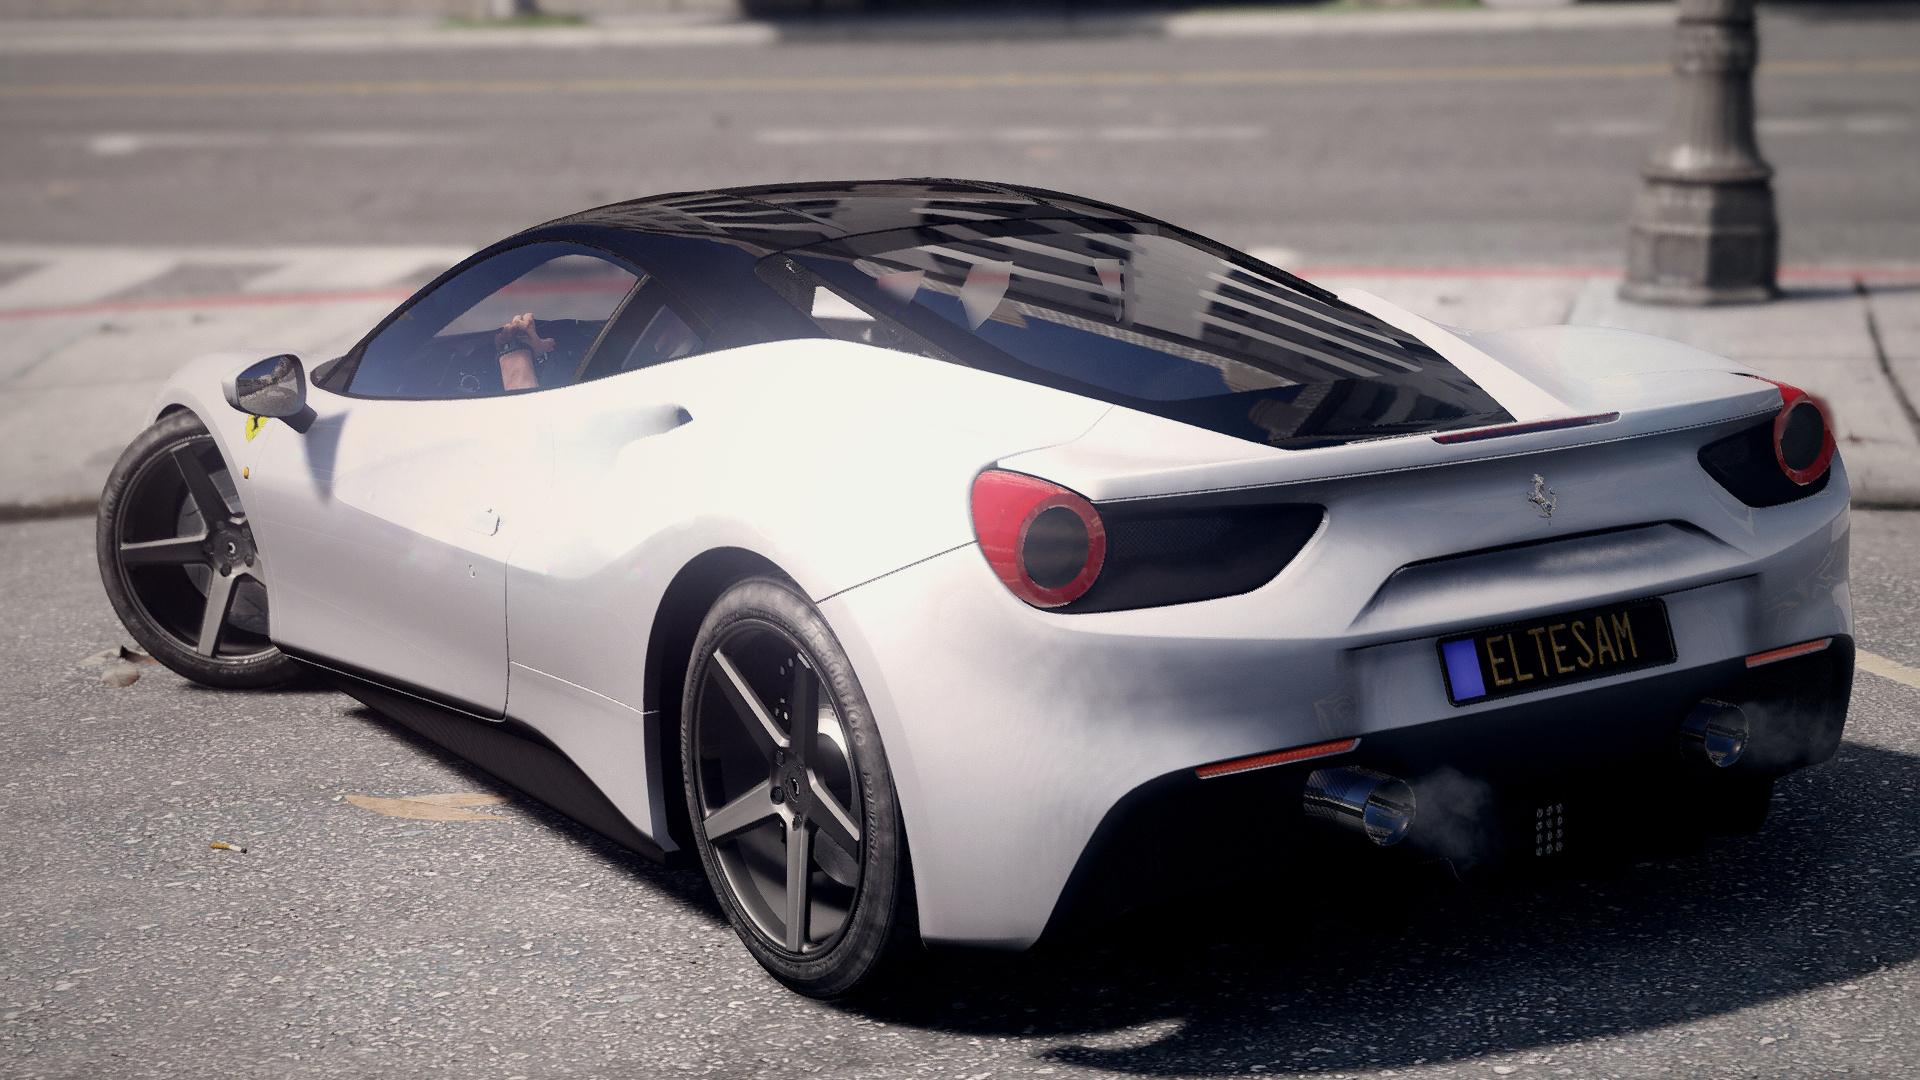 ferrari 488 gtb black roof - Ferrari 488 Gtb Black